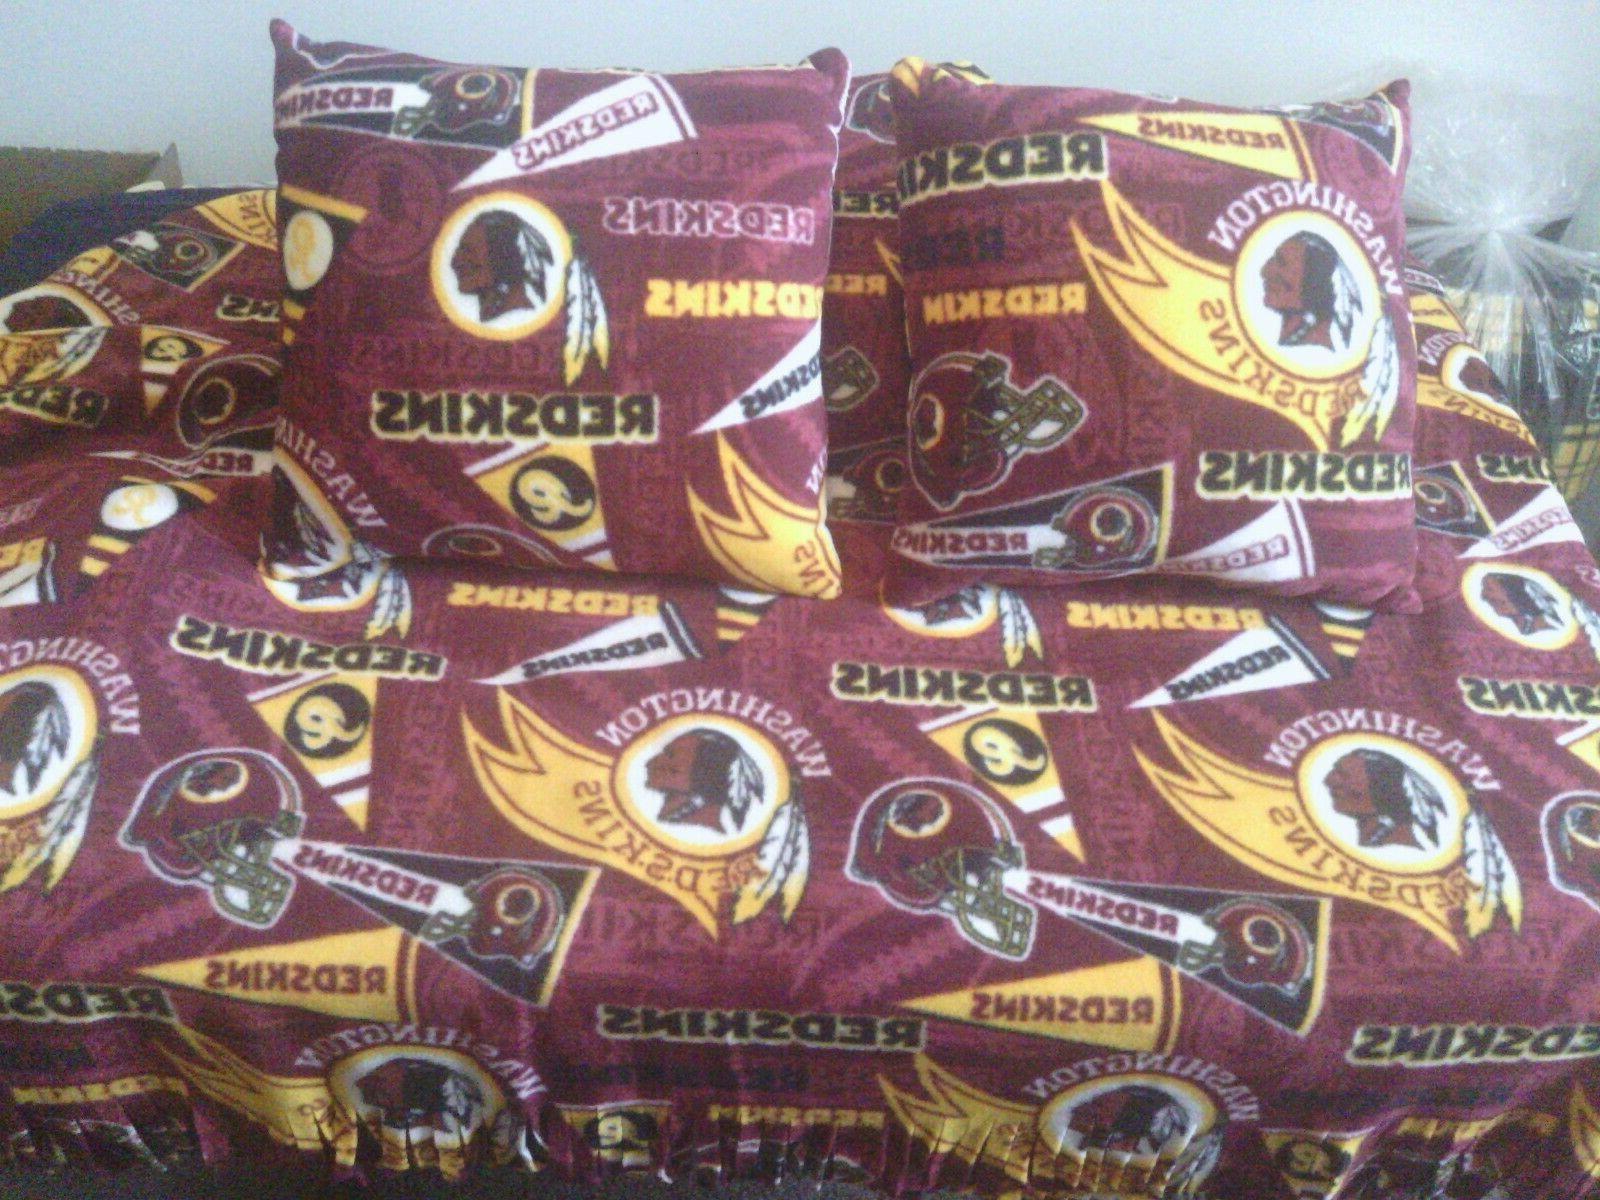 Fleece Blanket 2 Pillow Redskins